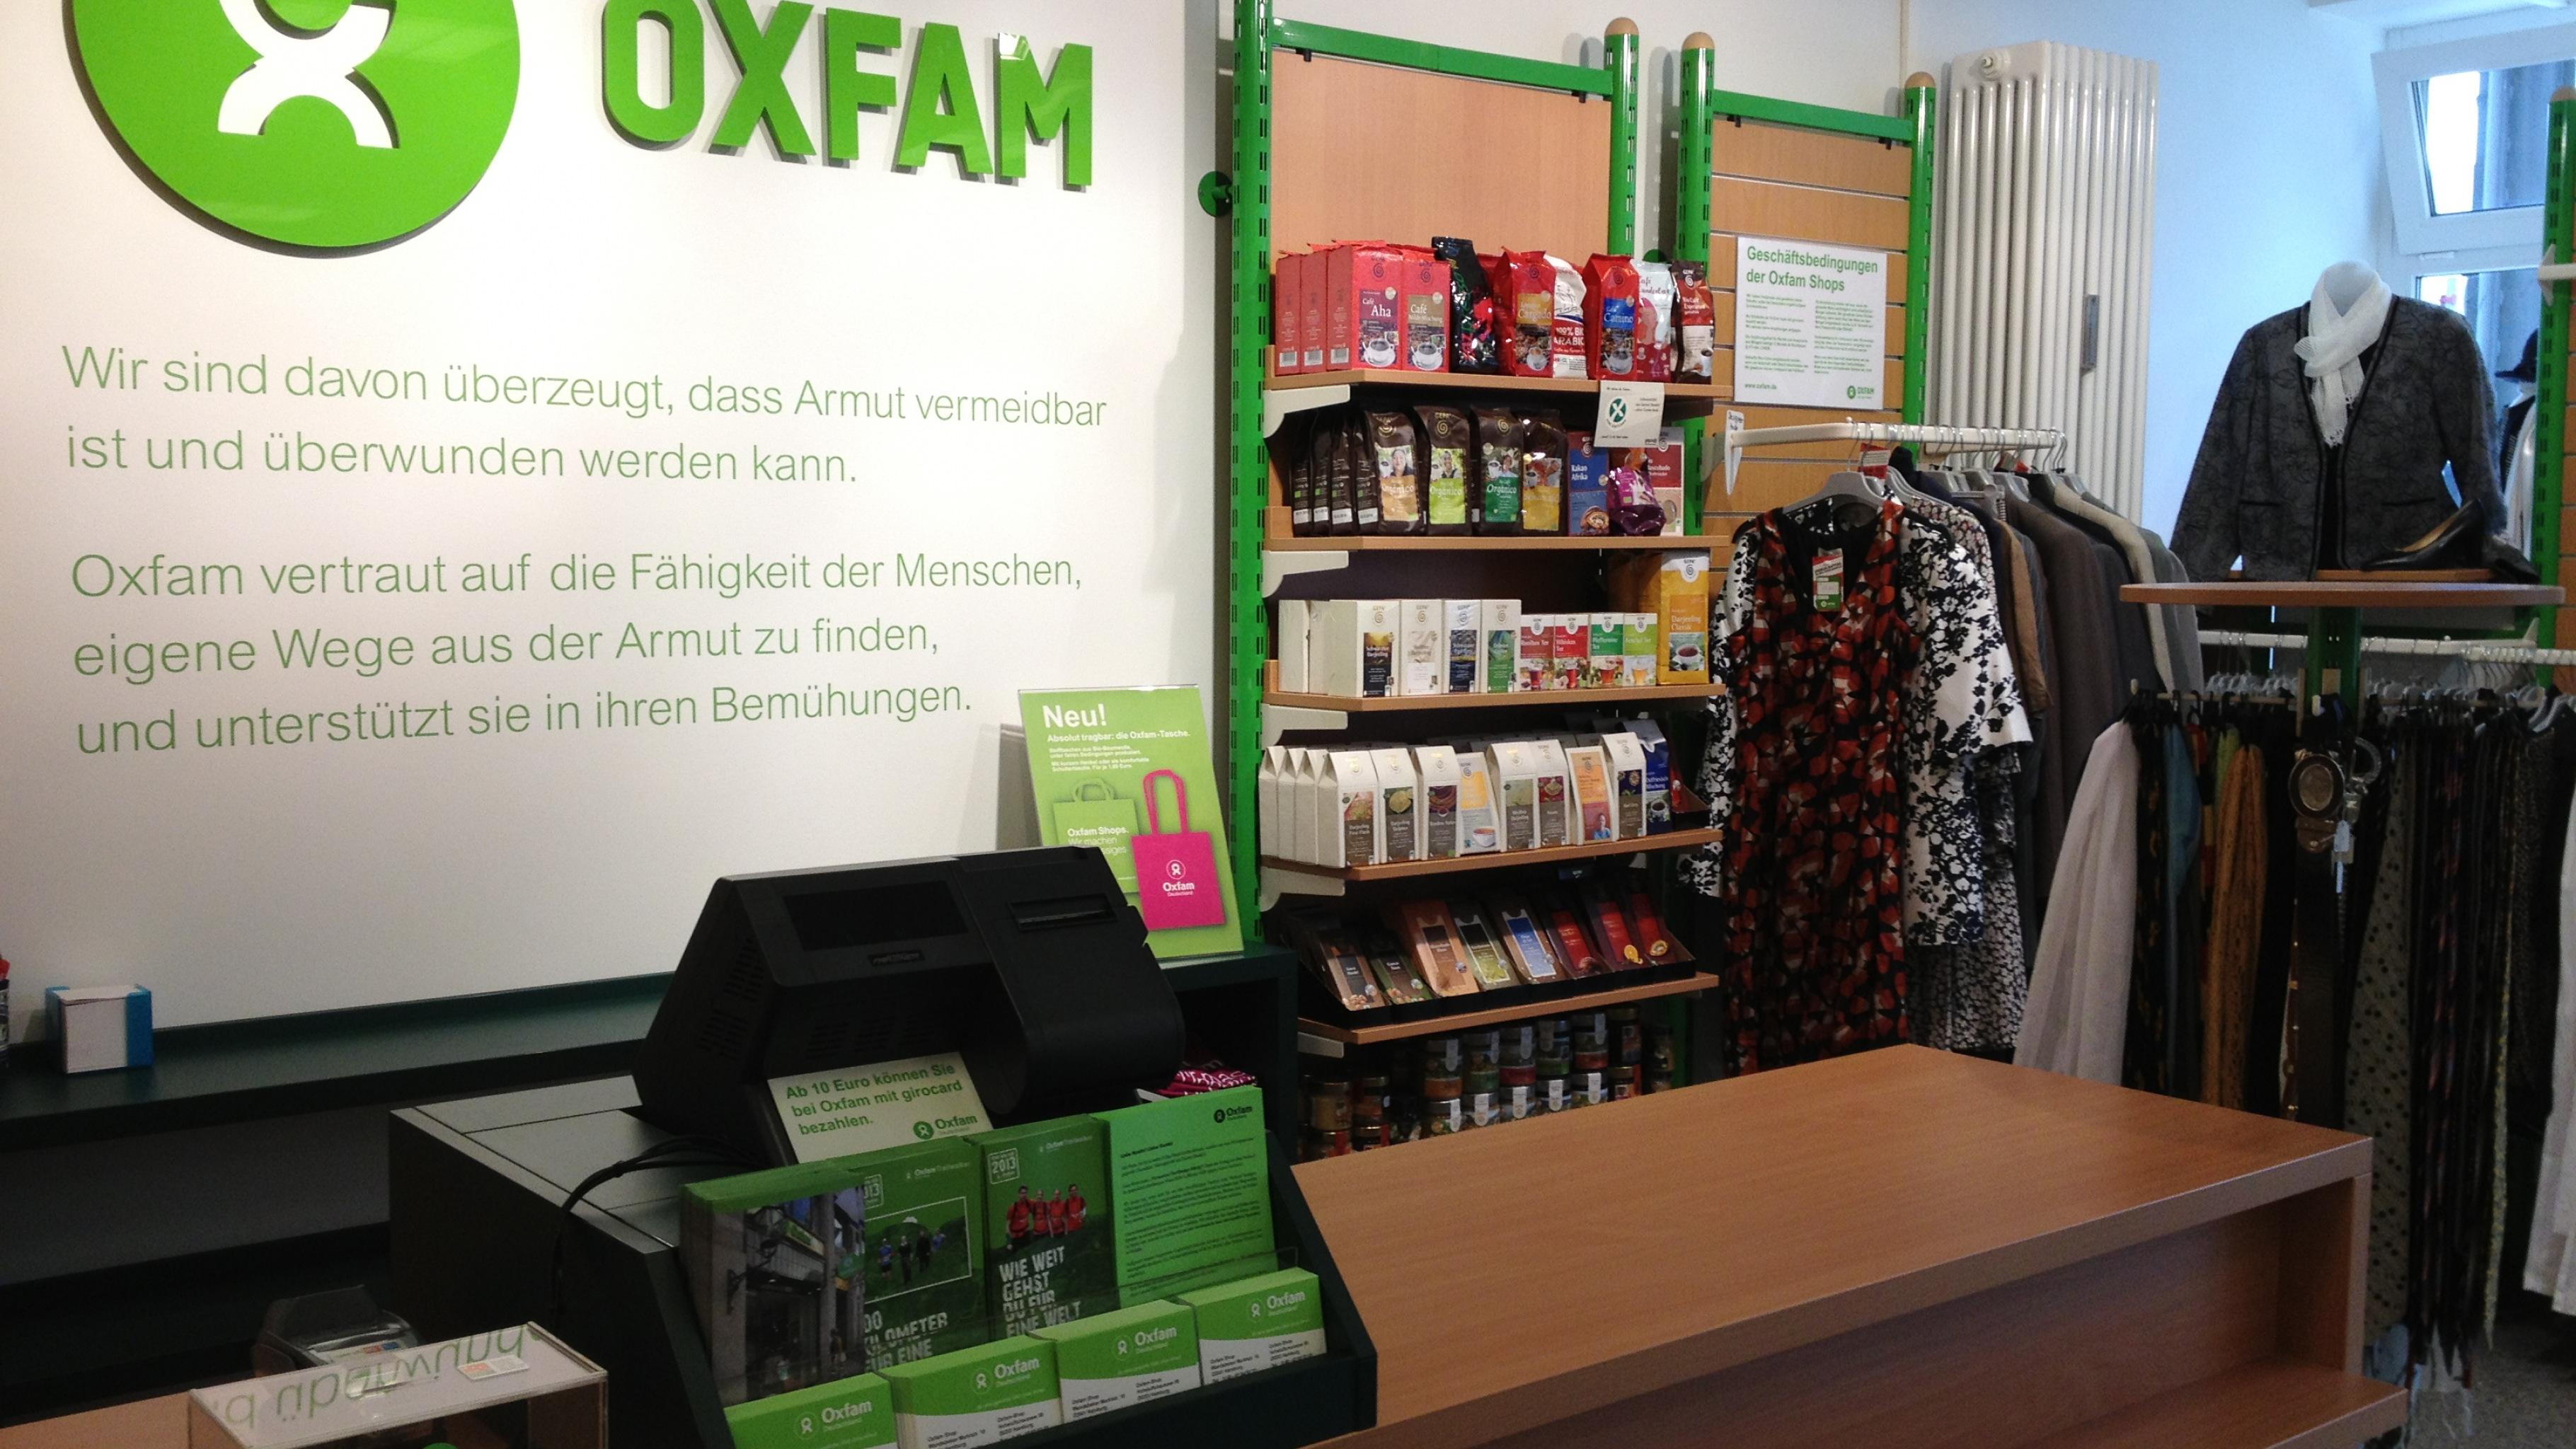 Oxfam Shop Hamburg-Wandsbek – Kassenbereich